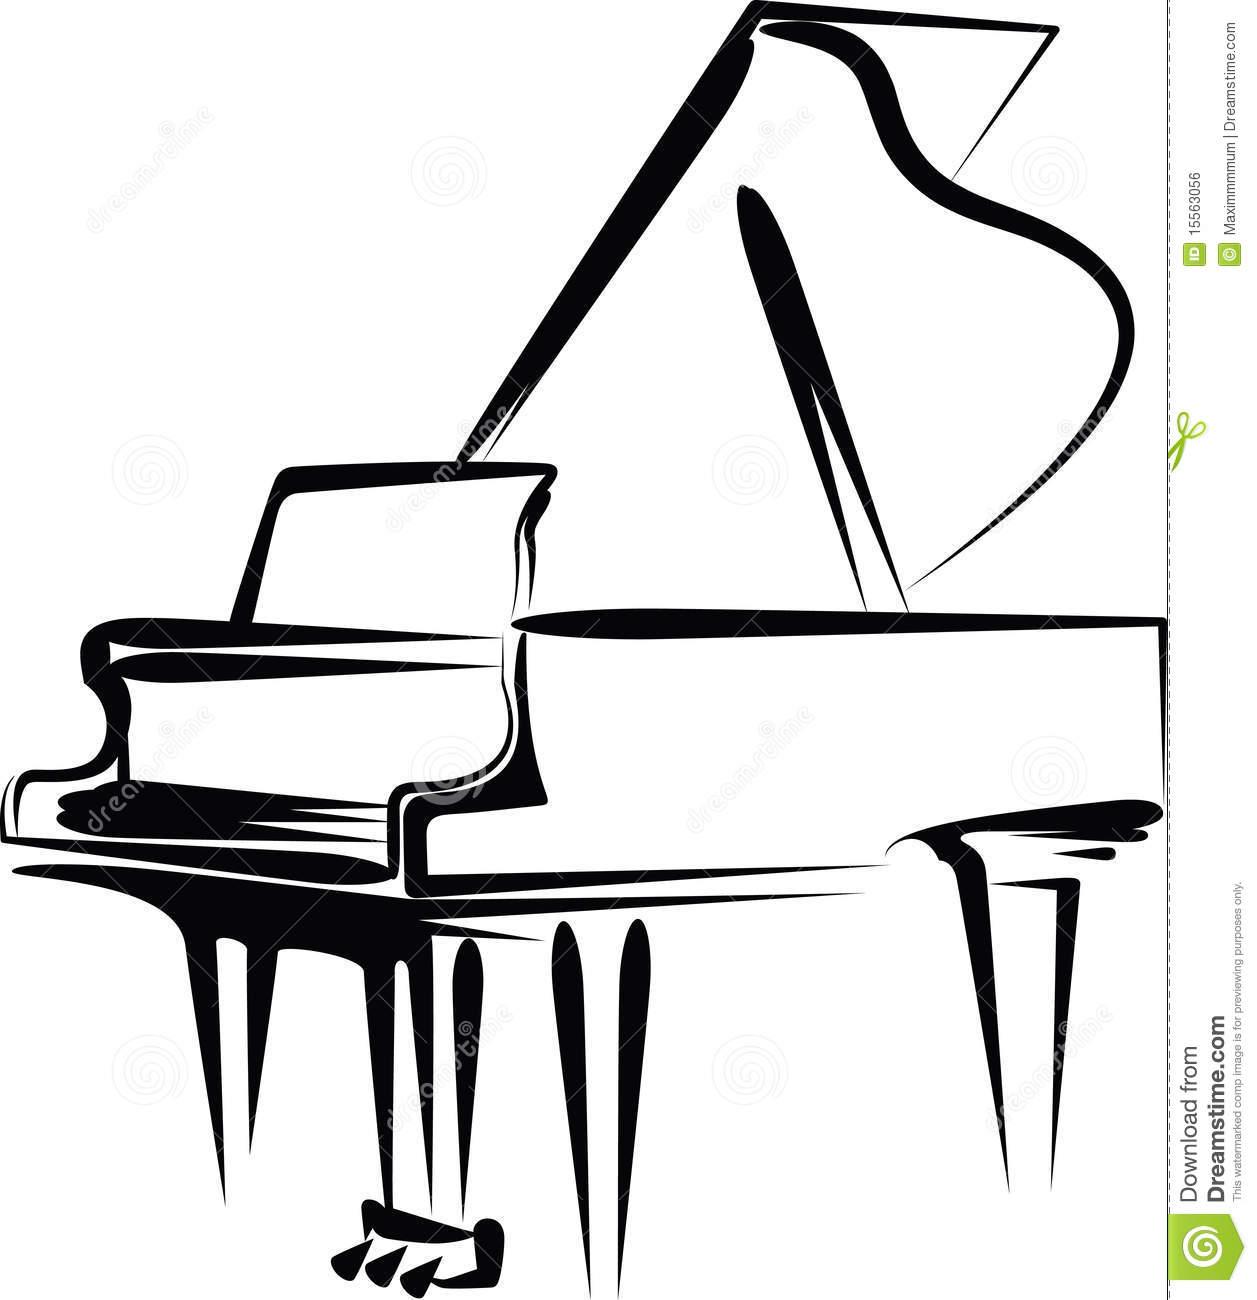 1257x1300 Free Piano Clipart Black And White